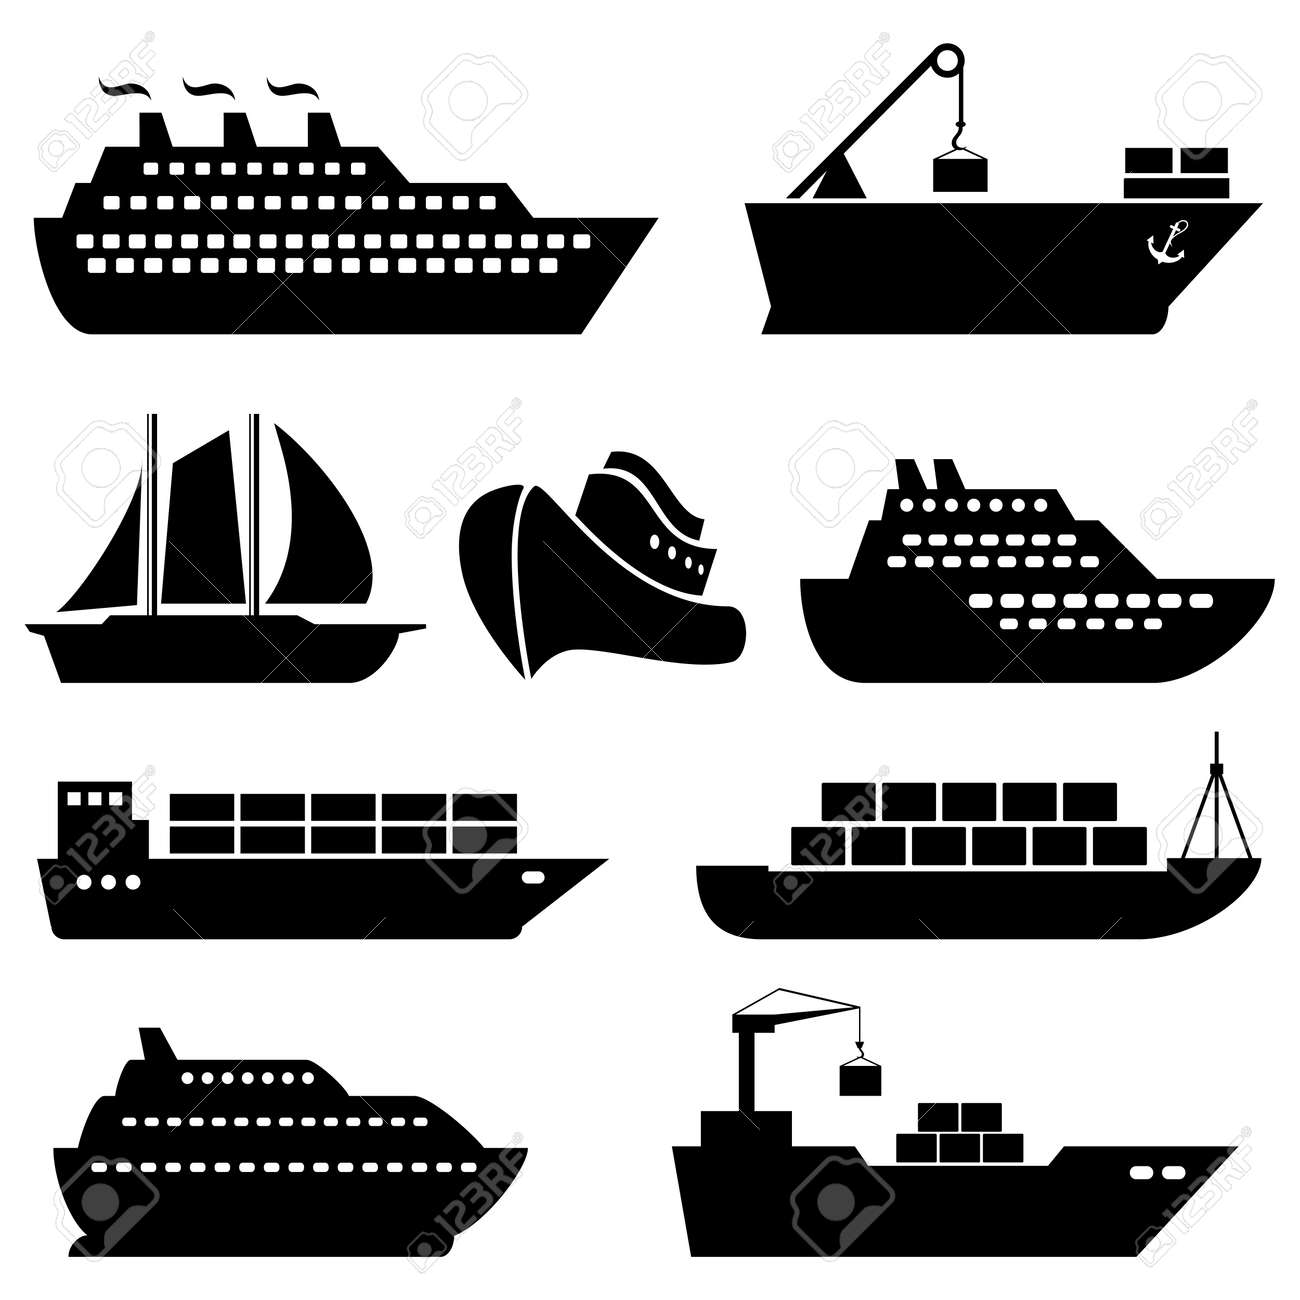 Ships, boats, cargo, logistics, transportation and shipping icons - 31426156